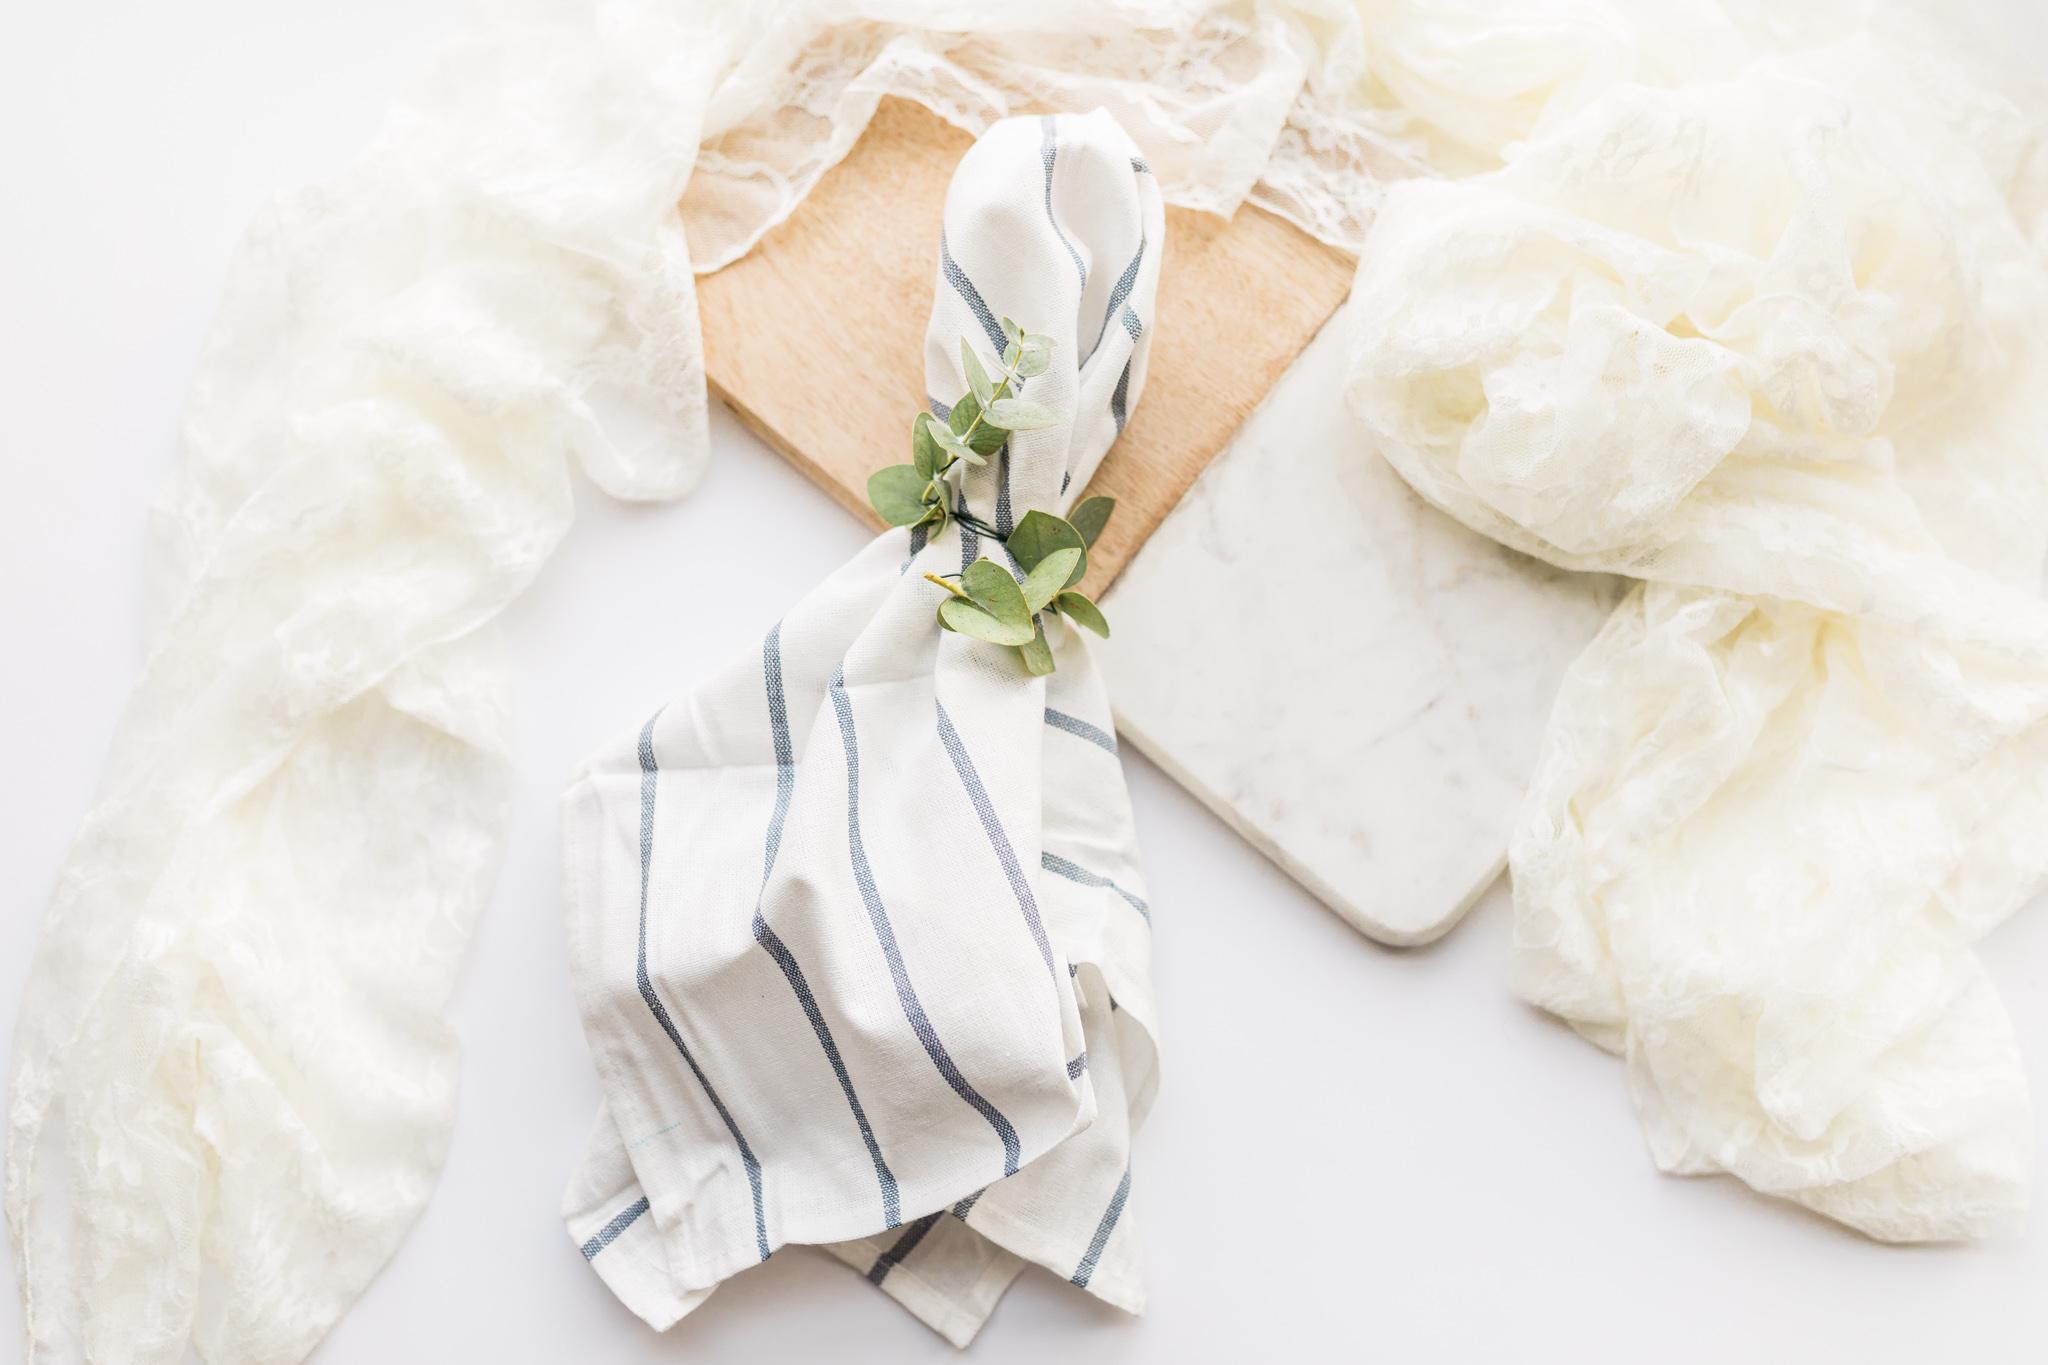 Diy Greenery Napkin Ring For Wedding Reception Laurenda Marie Photography Laurenda Marie Photography